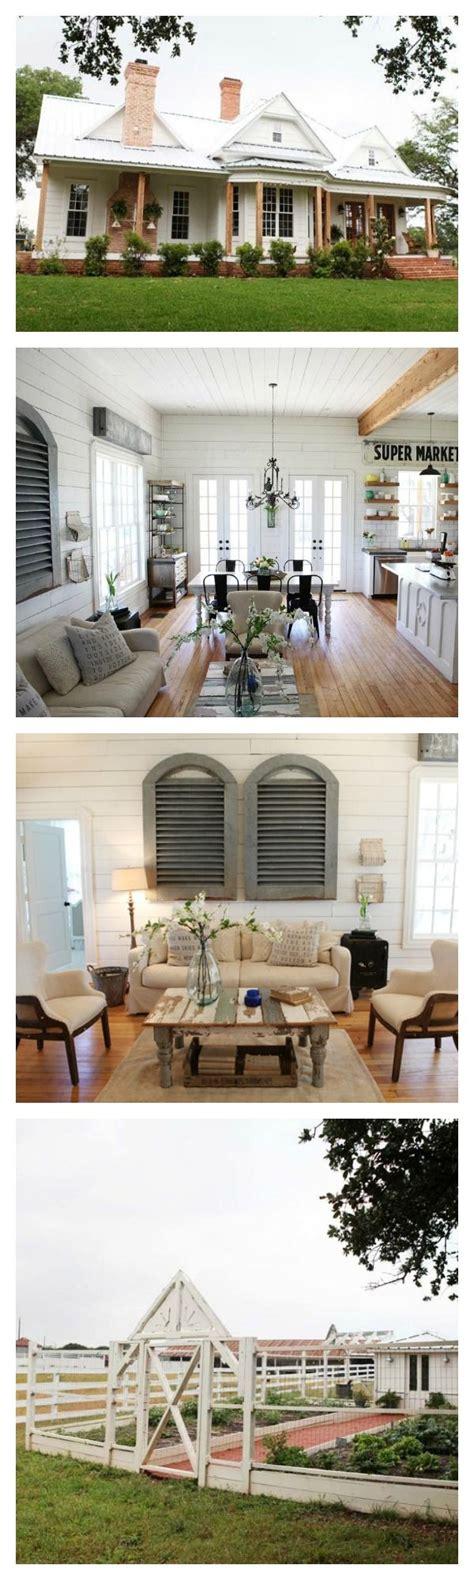 magnolia market 40 photos interior design 3801 14 best fixer upper floor plans images on pinterest